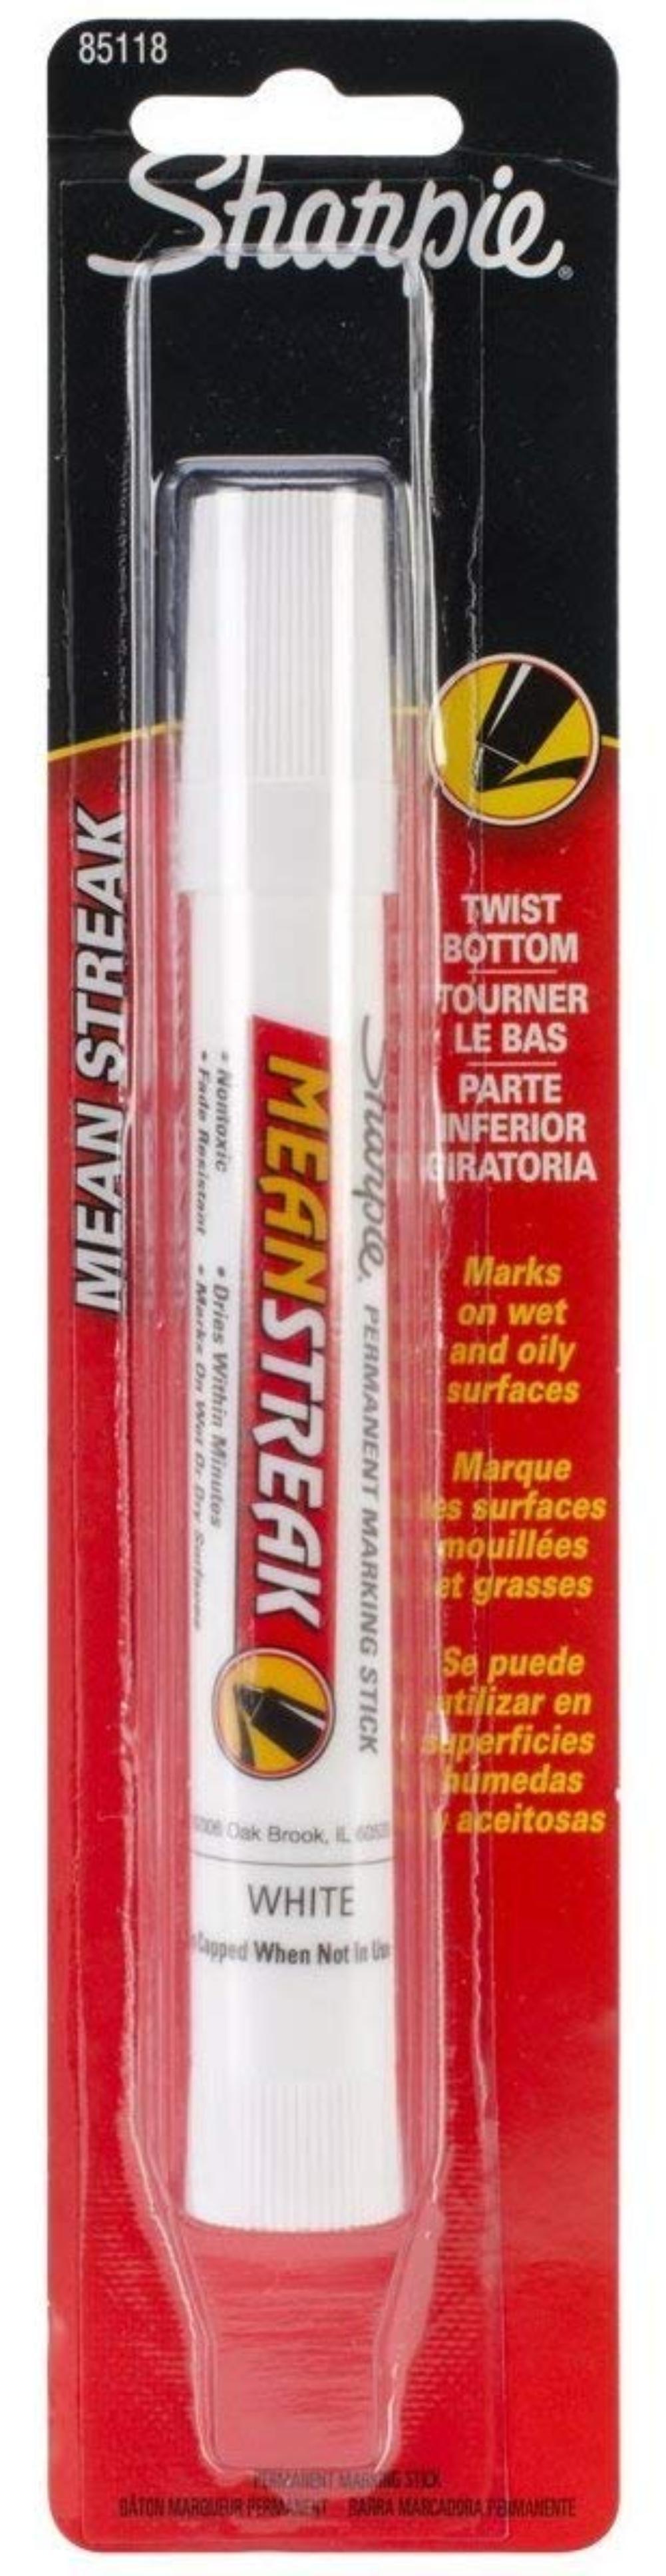 Sharpie 85118-PP MeanStreak Permanent Marker; pack of 1